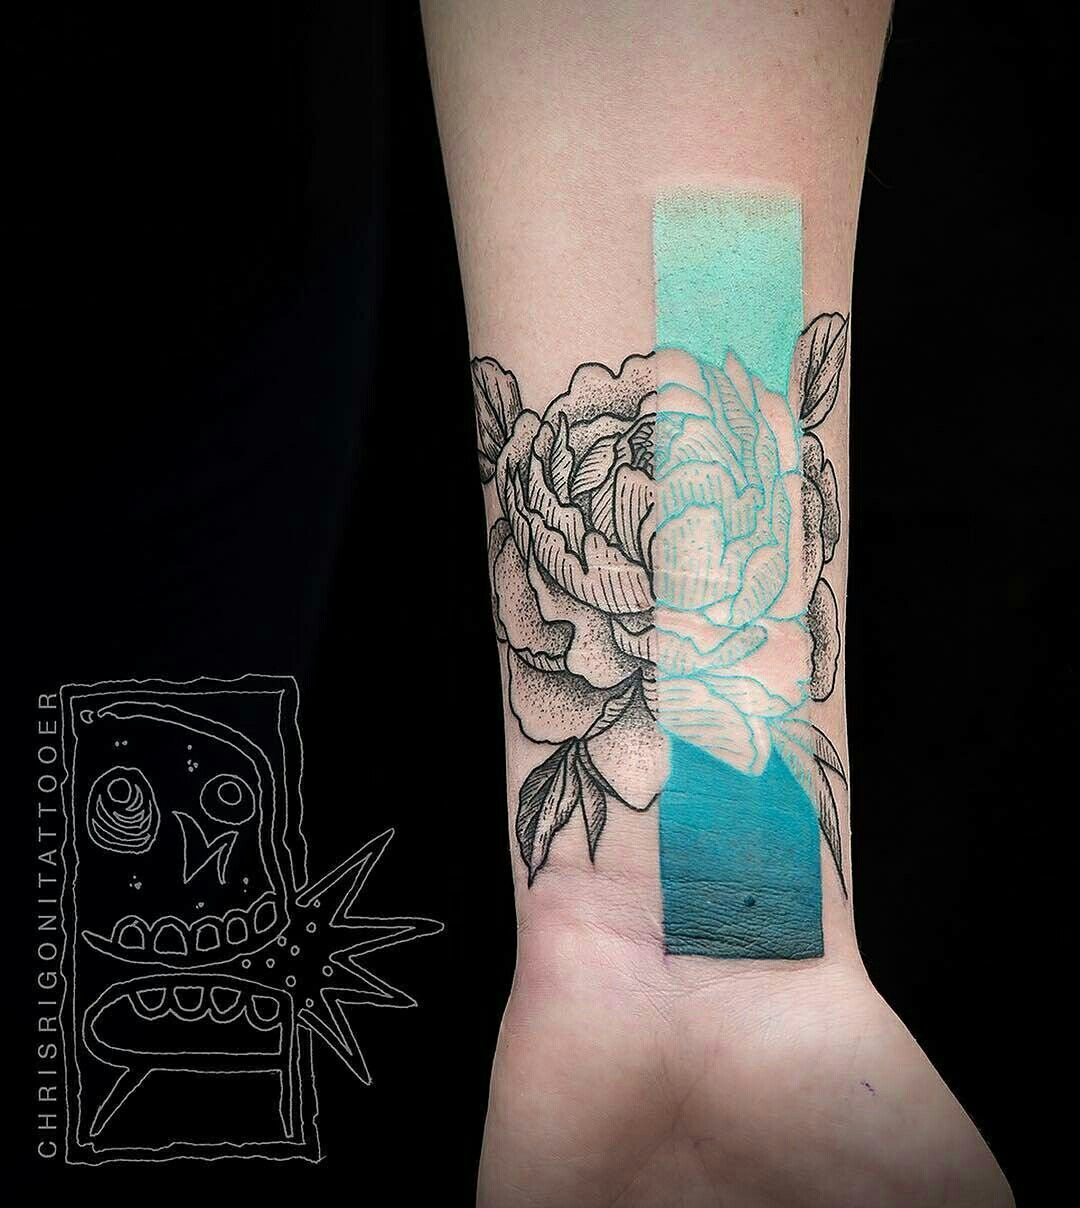 ️preetivicki ⚡️} Tattoos, Inspirational tattoos